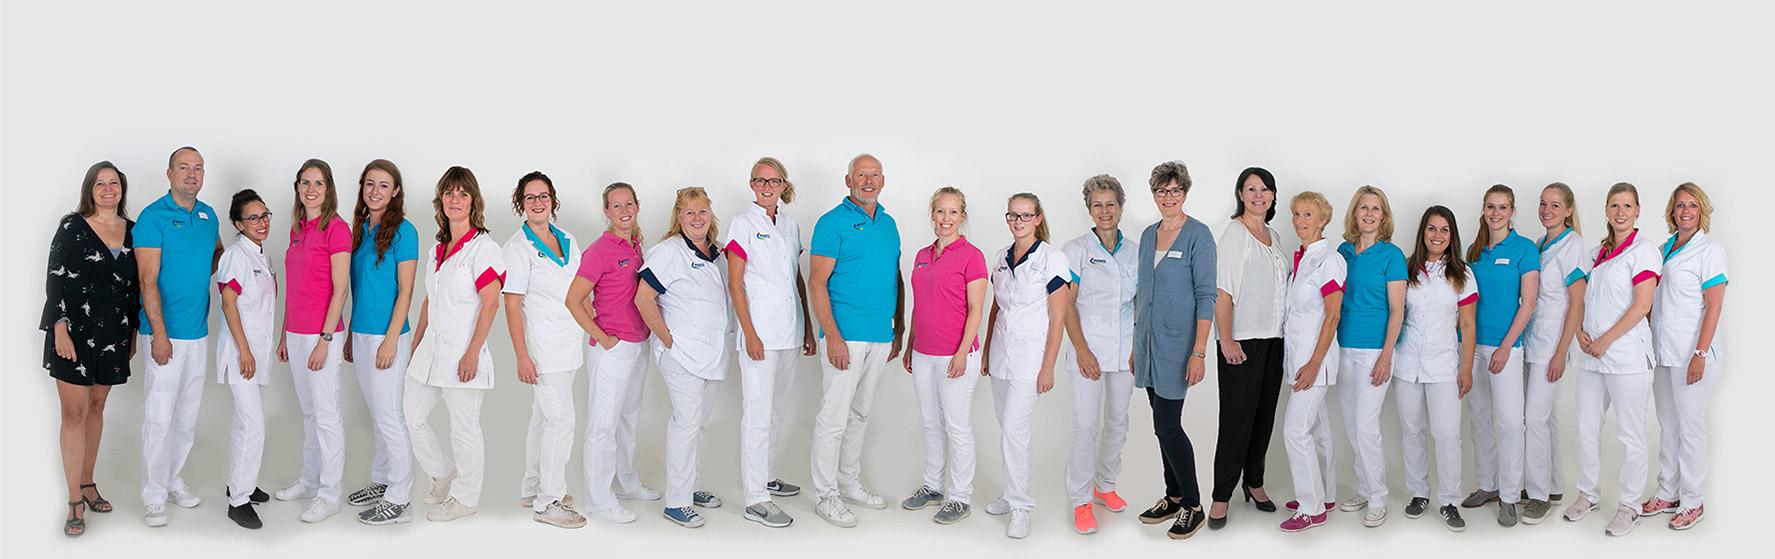 groepsfoto tandartspraktijk de boemerang